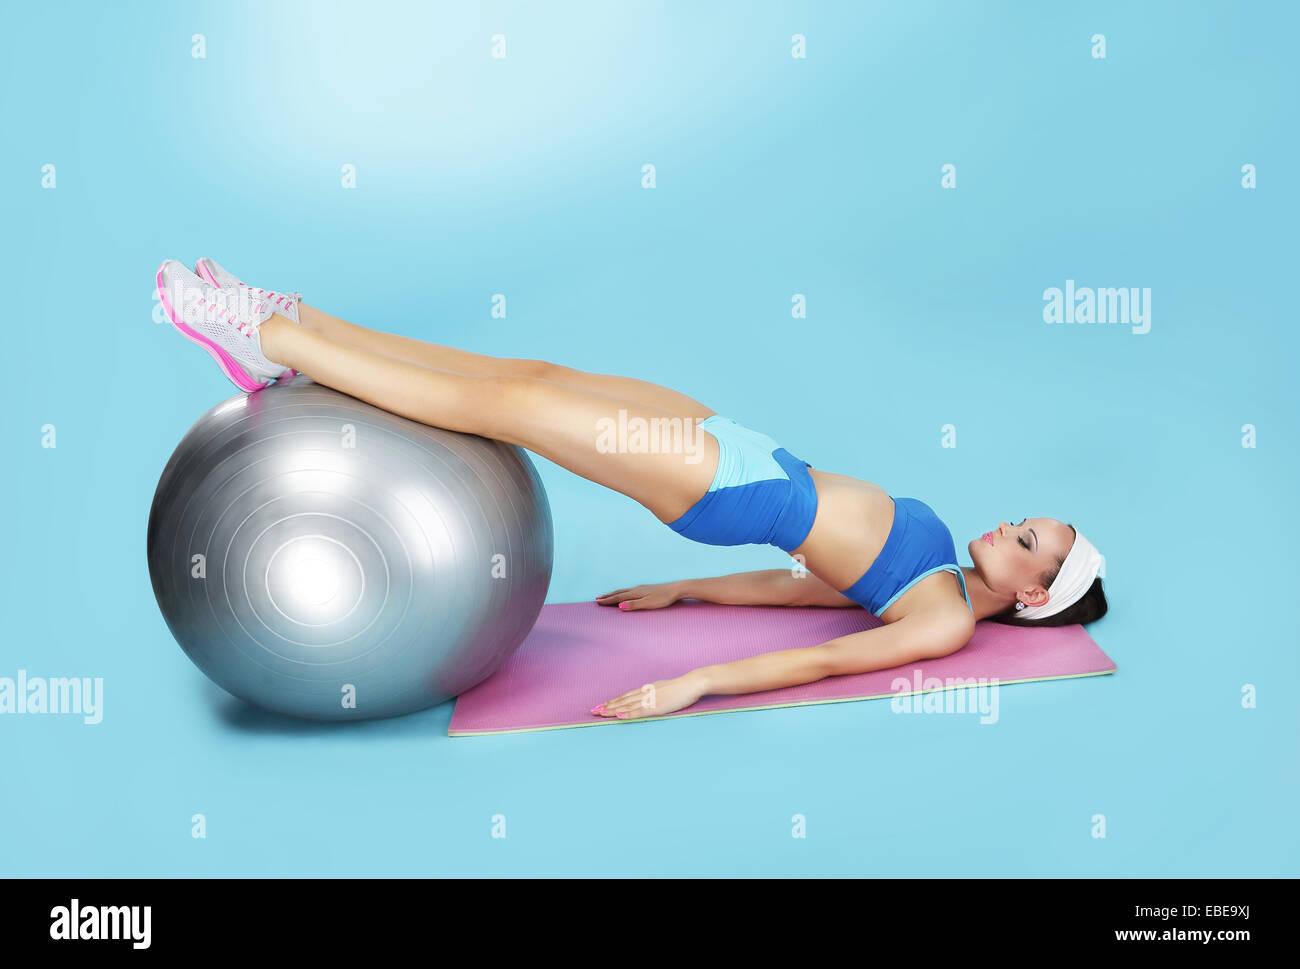 Bauch-Übung. Sportliche Frau mit Fitness-Ball Stockbild